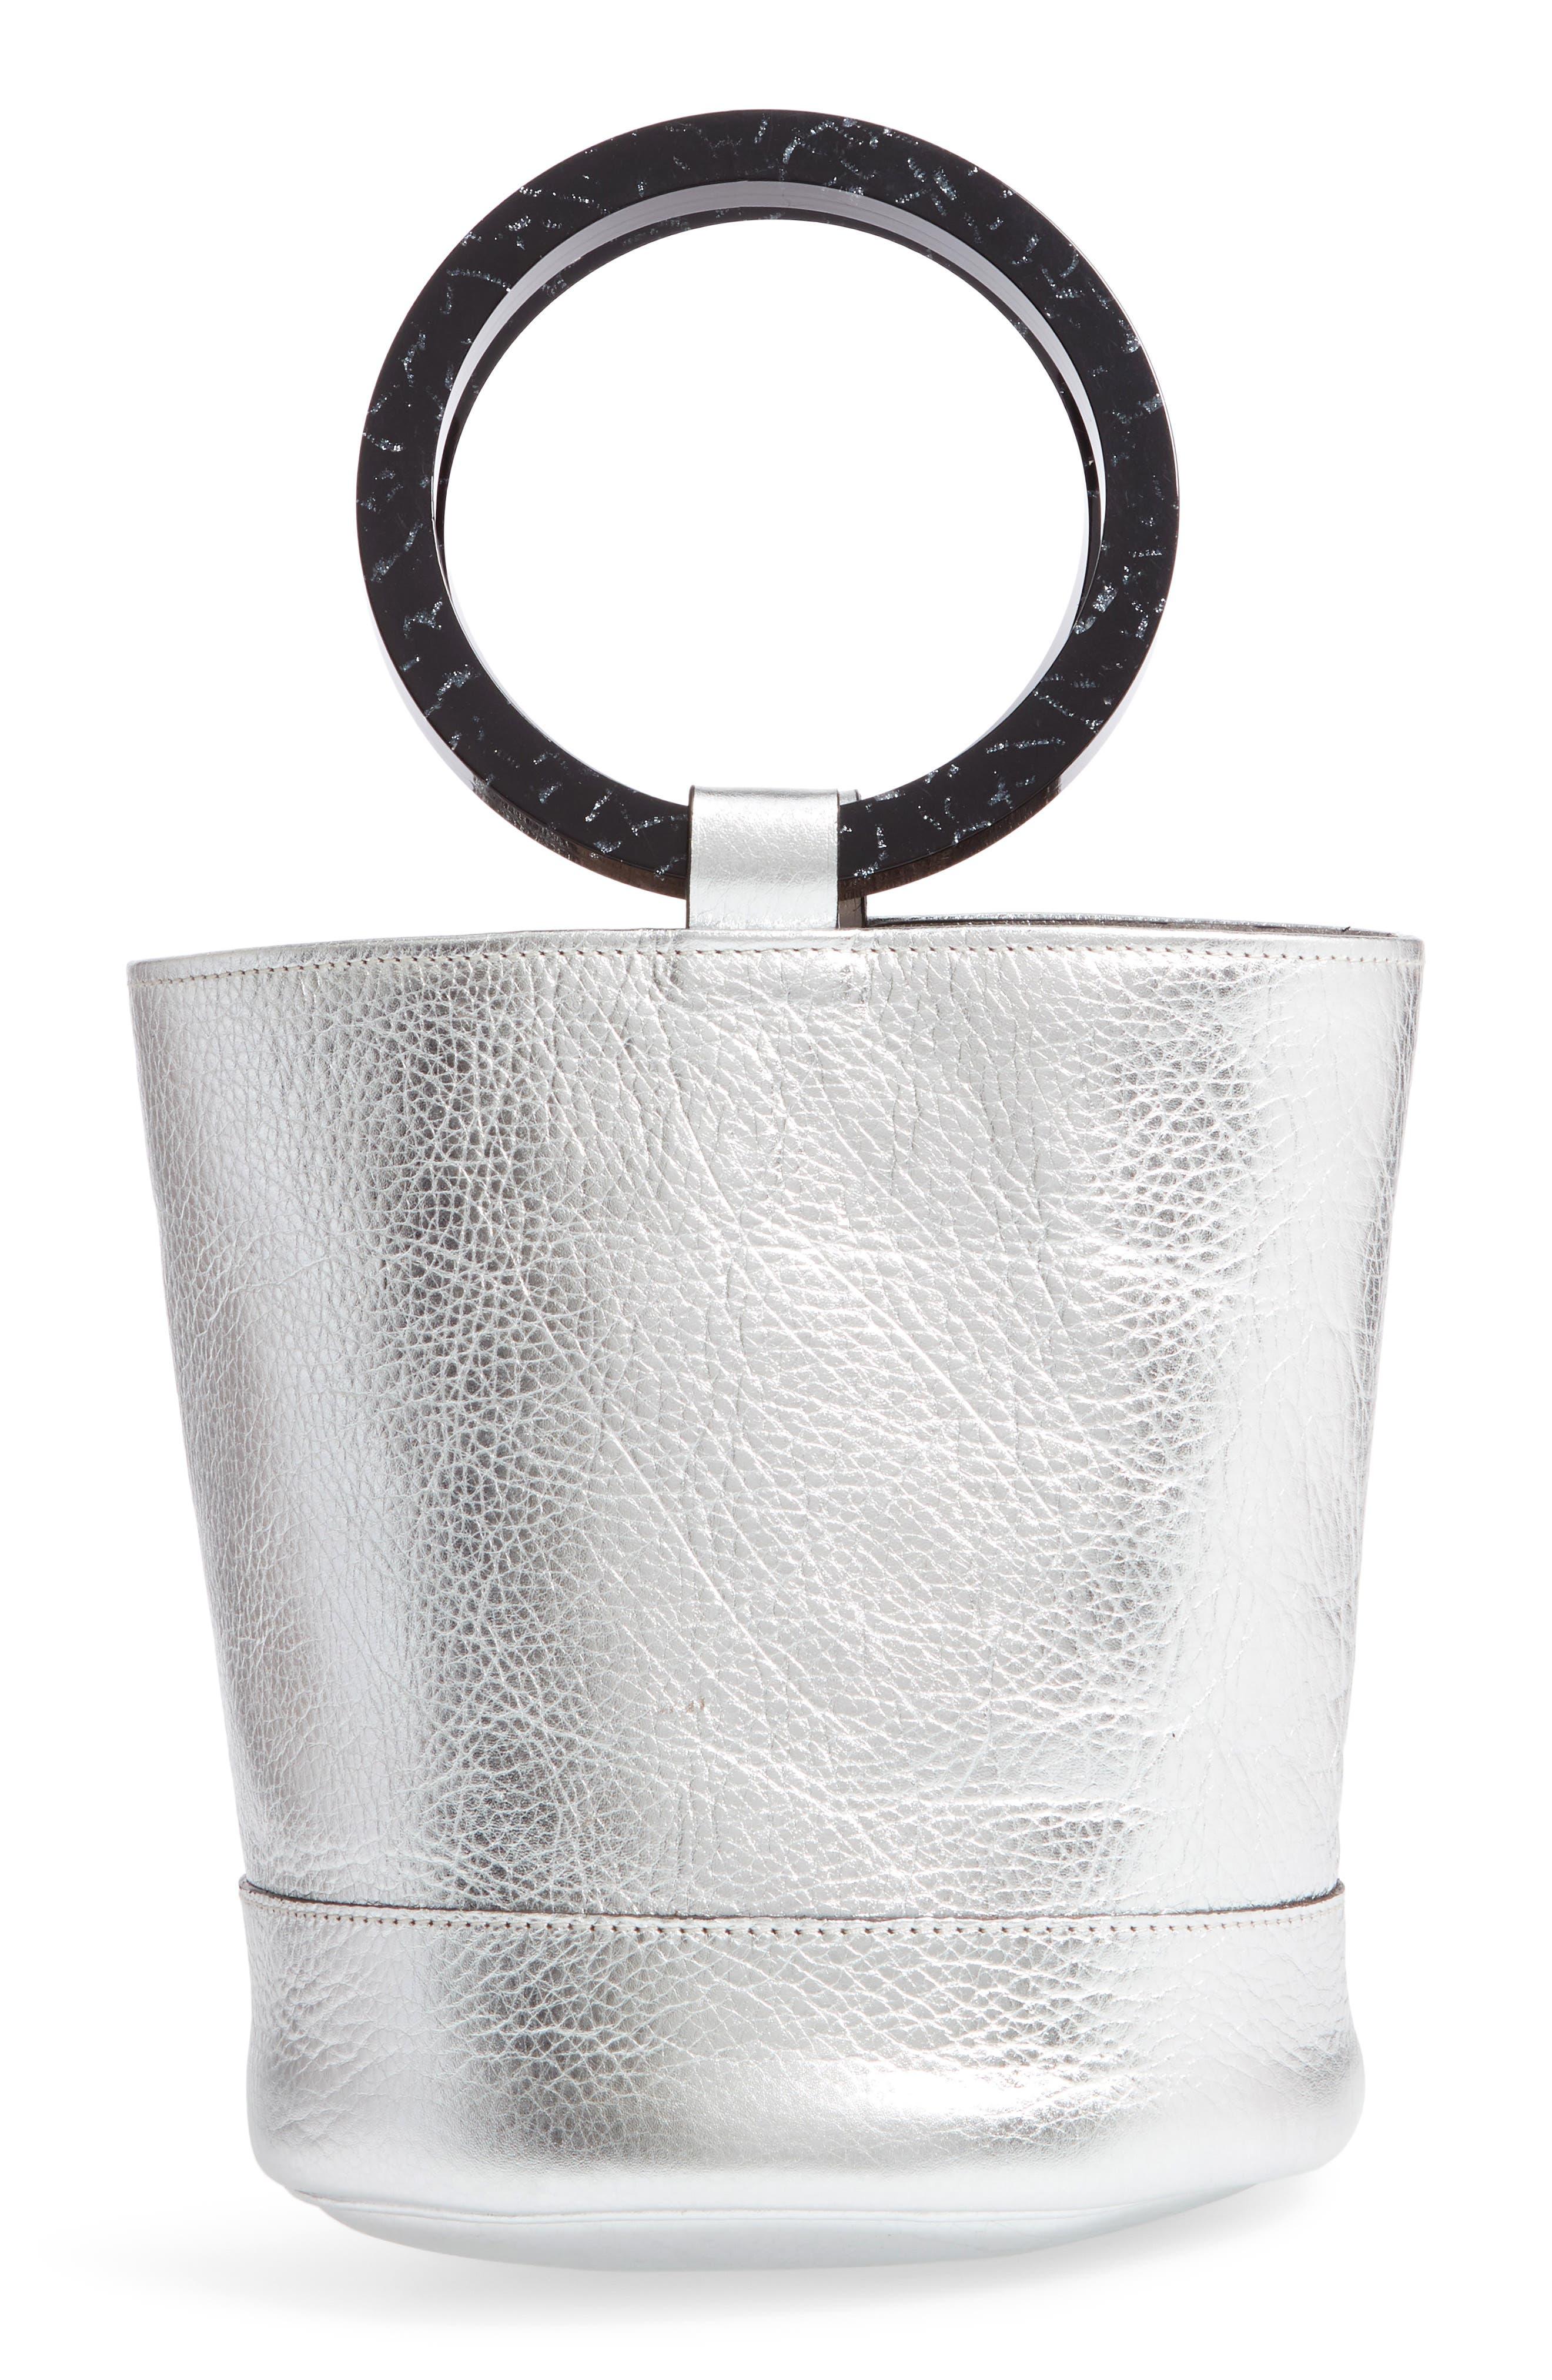 Bonsai 20 Pebbled Leather Bucket Bag,                         Main,                         color, Silver